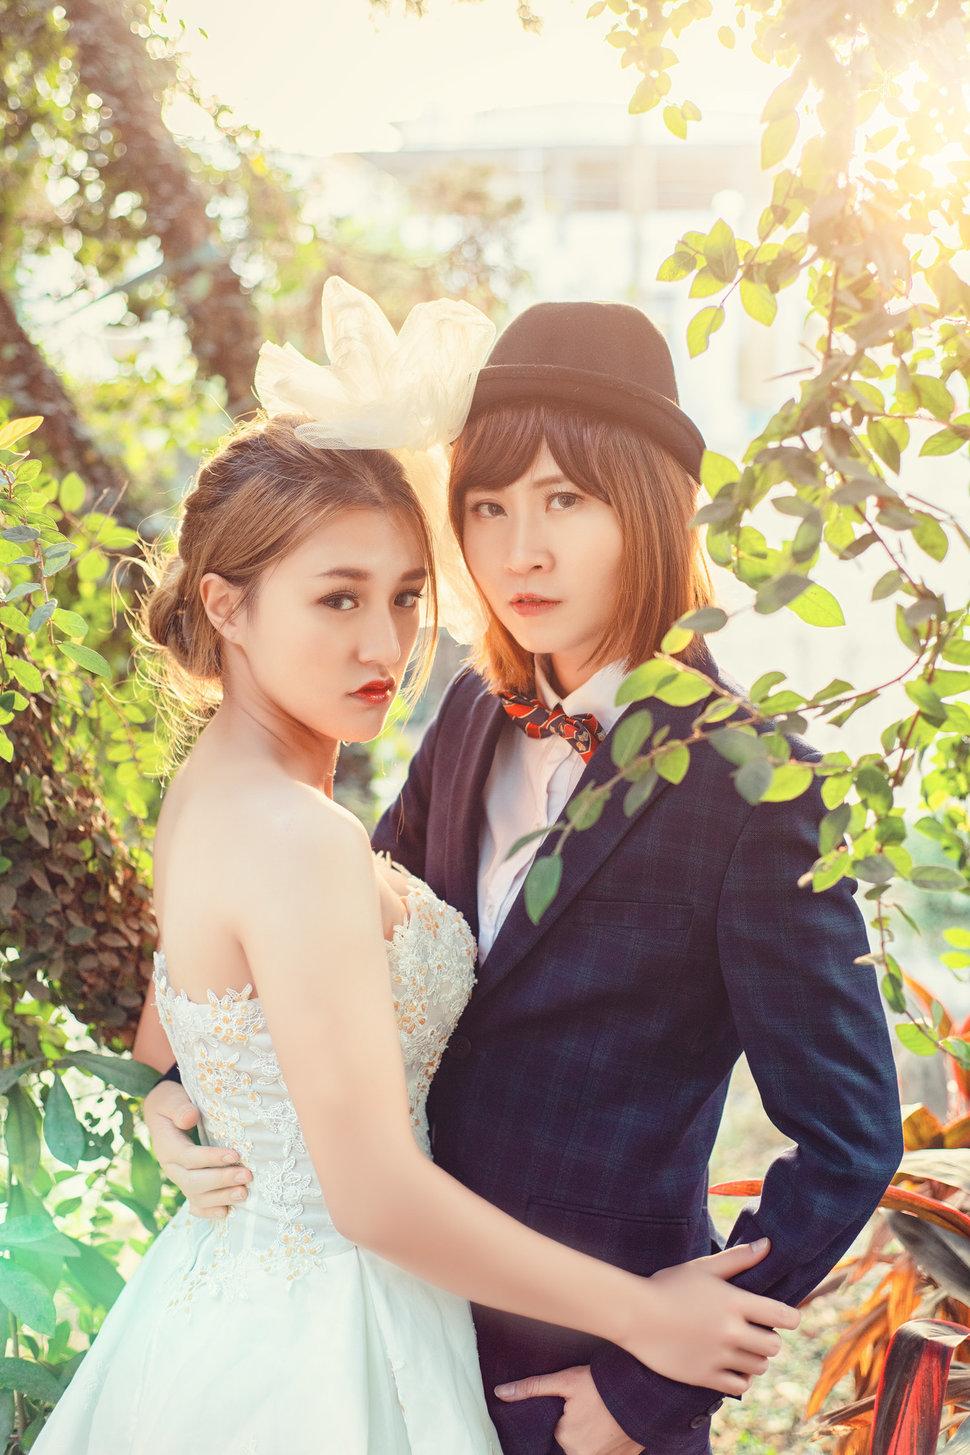 32356260277_9022a90e78_k (1) - Dong攝影工作室 - 結婚吧